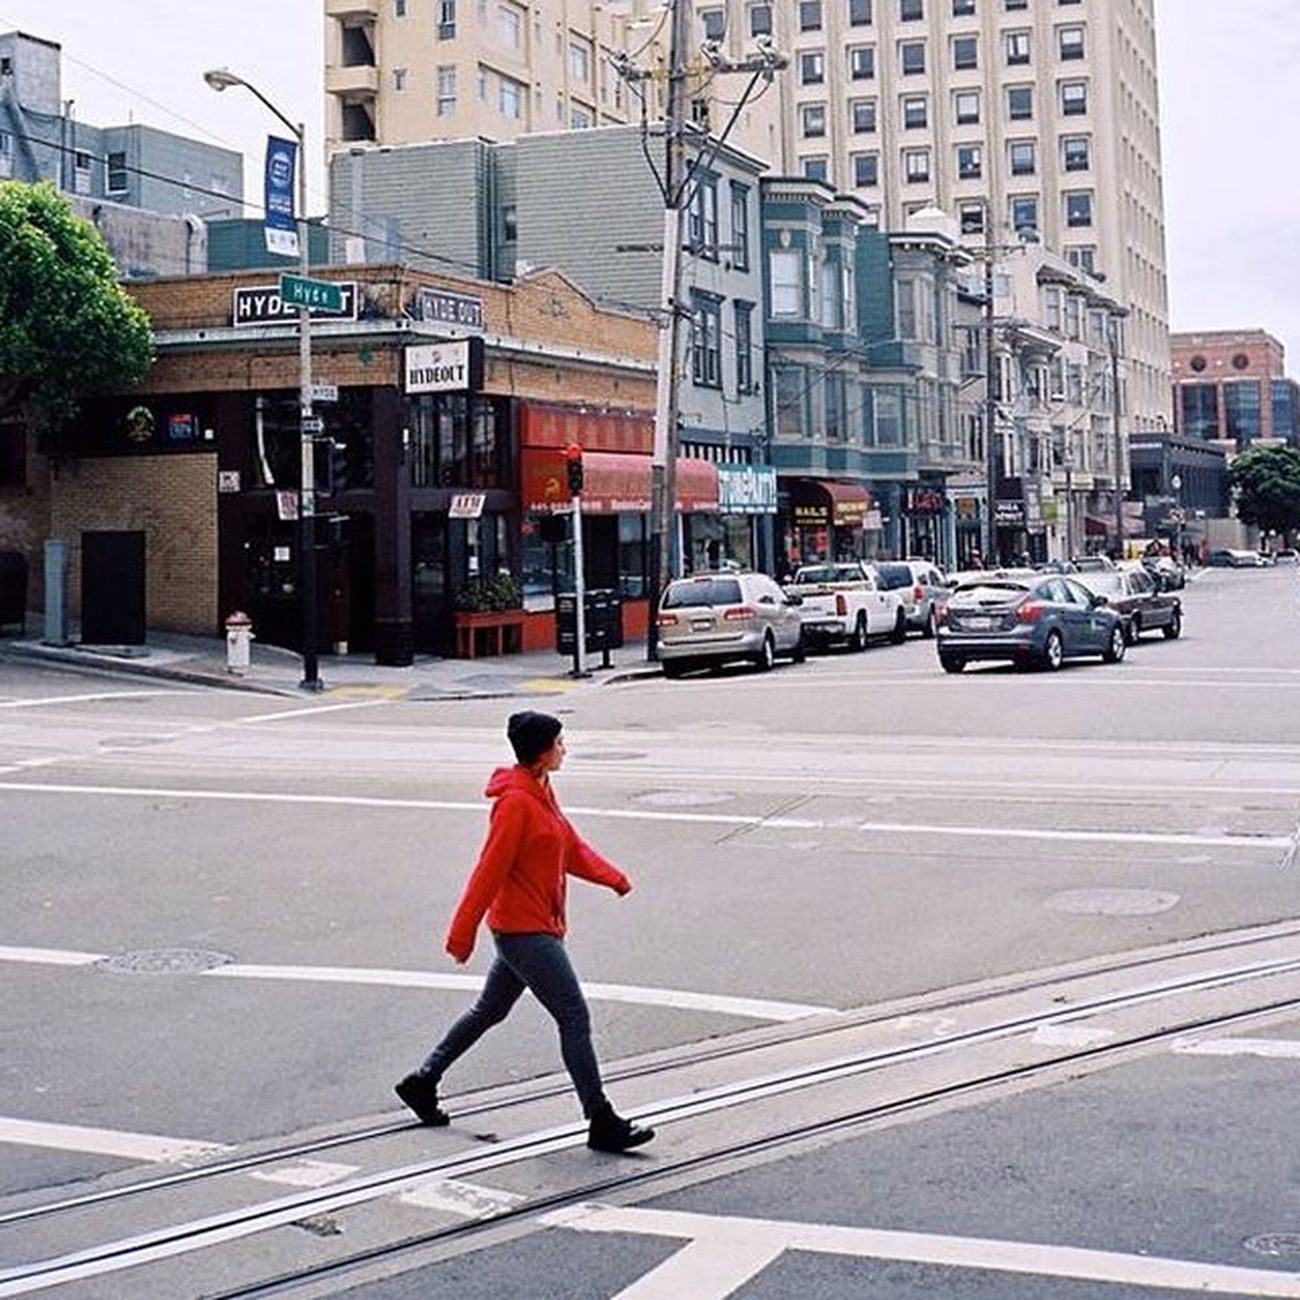 USA Sanfrancisco People City Contax Cymera Contaxt3 Cymeraapp VSCO Vscocam Film Blackandwhite